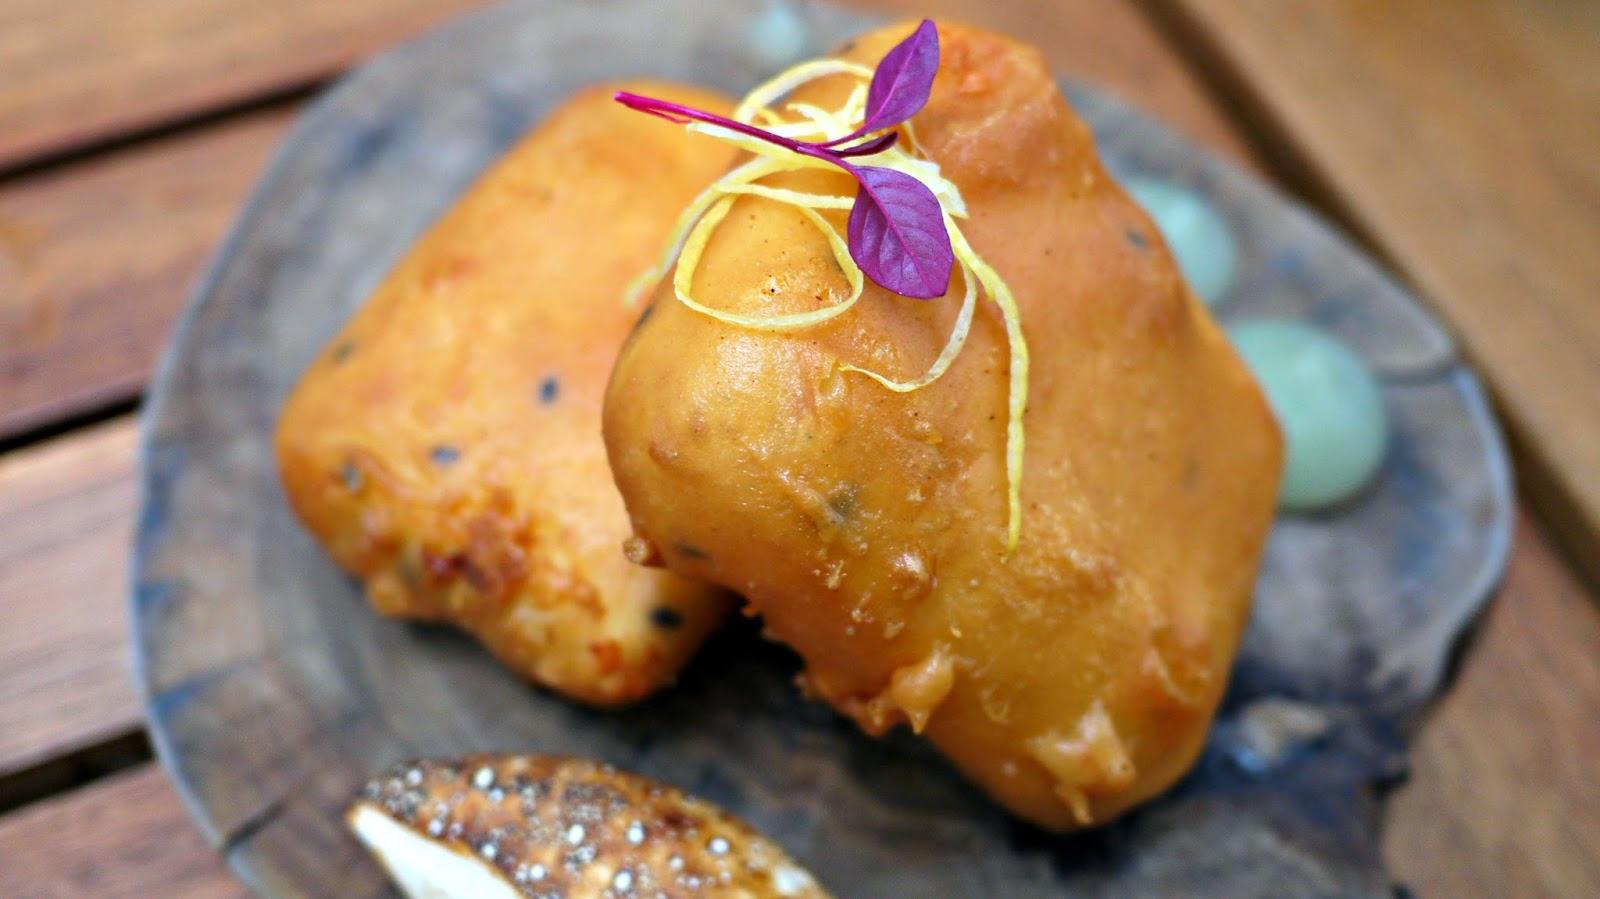 Mazi Feta tempura with sweet caper meringue and lemon marmalade